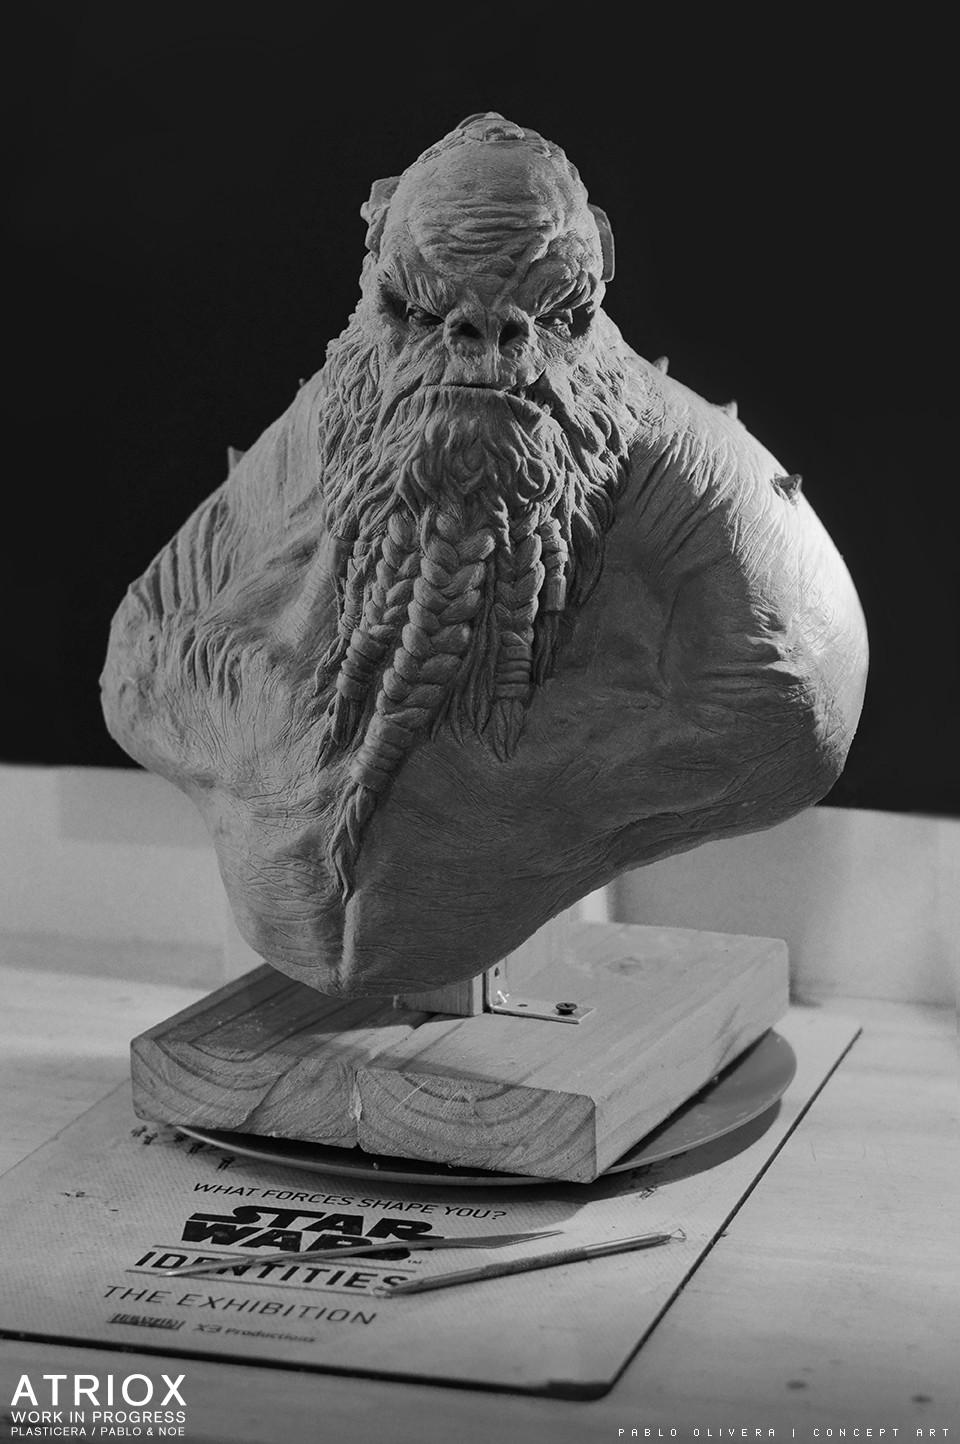 Pablo olivera atriox sculpture plasticera by pablo olivera 03